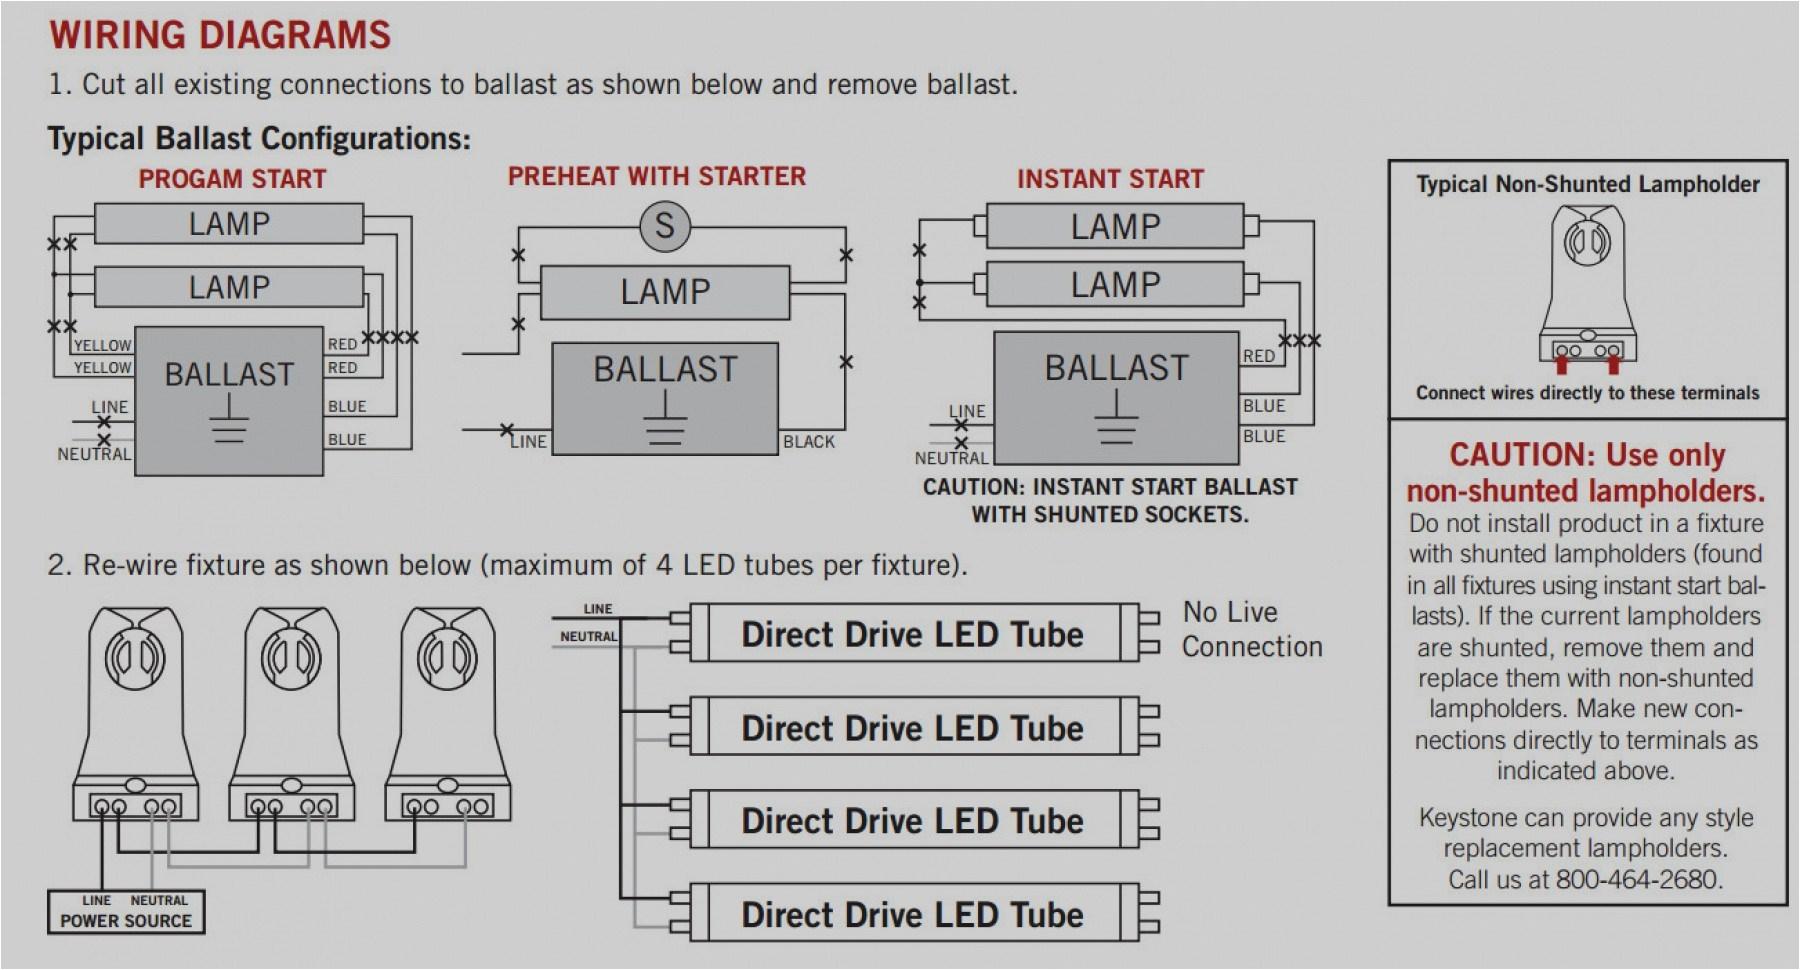 [DIAGRAM_38IU]  5915A5 Non Shunted Lamp Holders | BradsHomeFurnishings | Wiring Library | 12 Fluorescent Light Wiring Diagram |  | Wiring Library